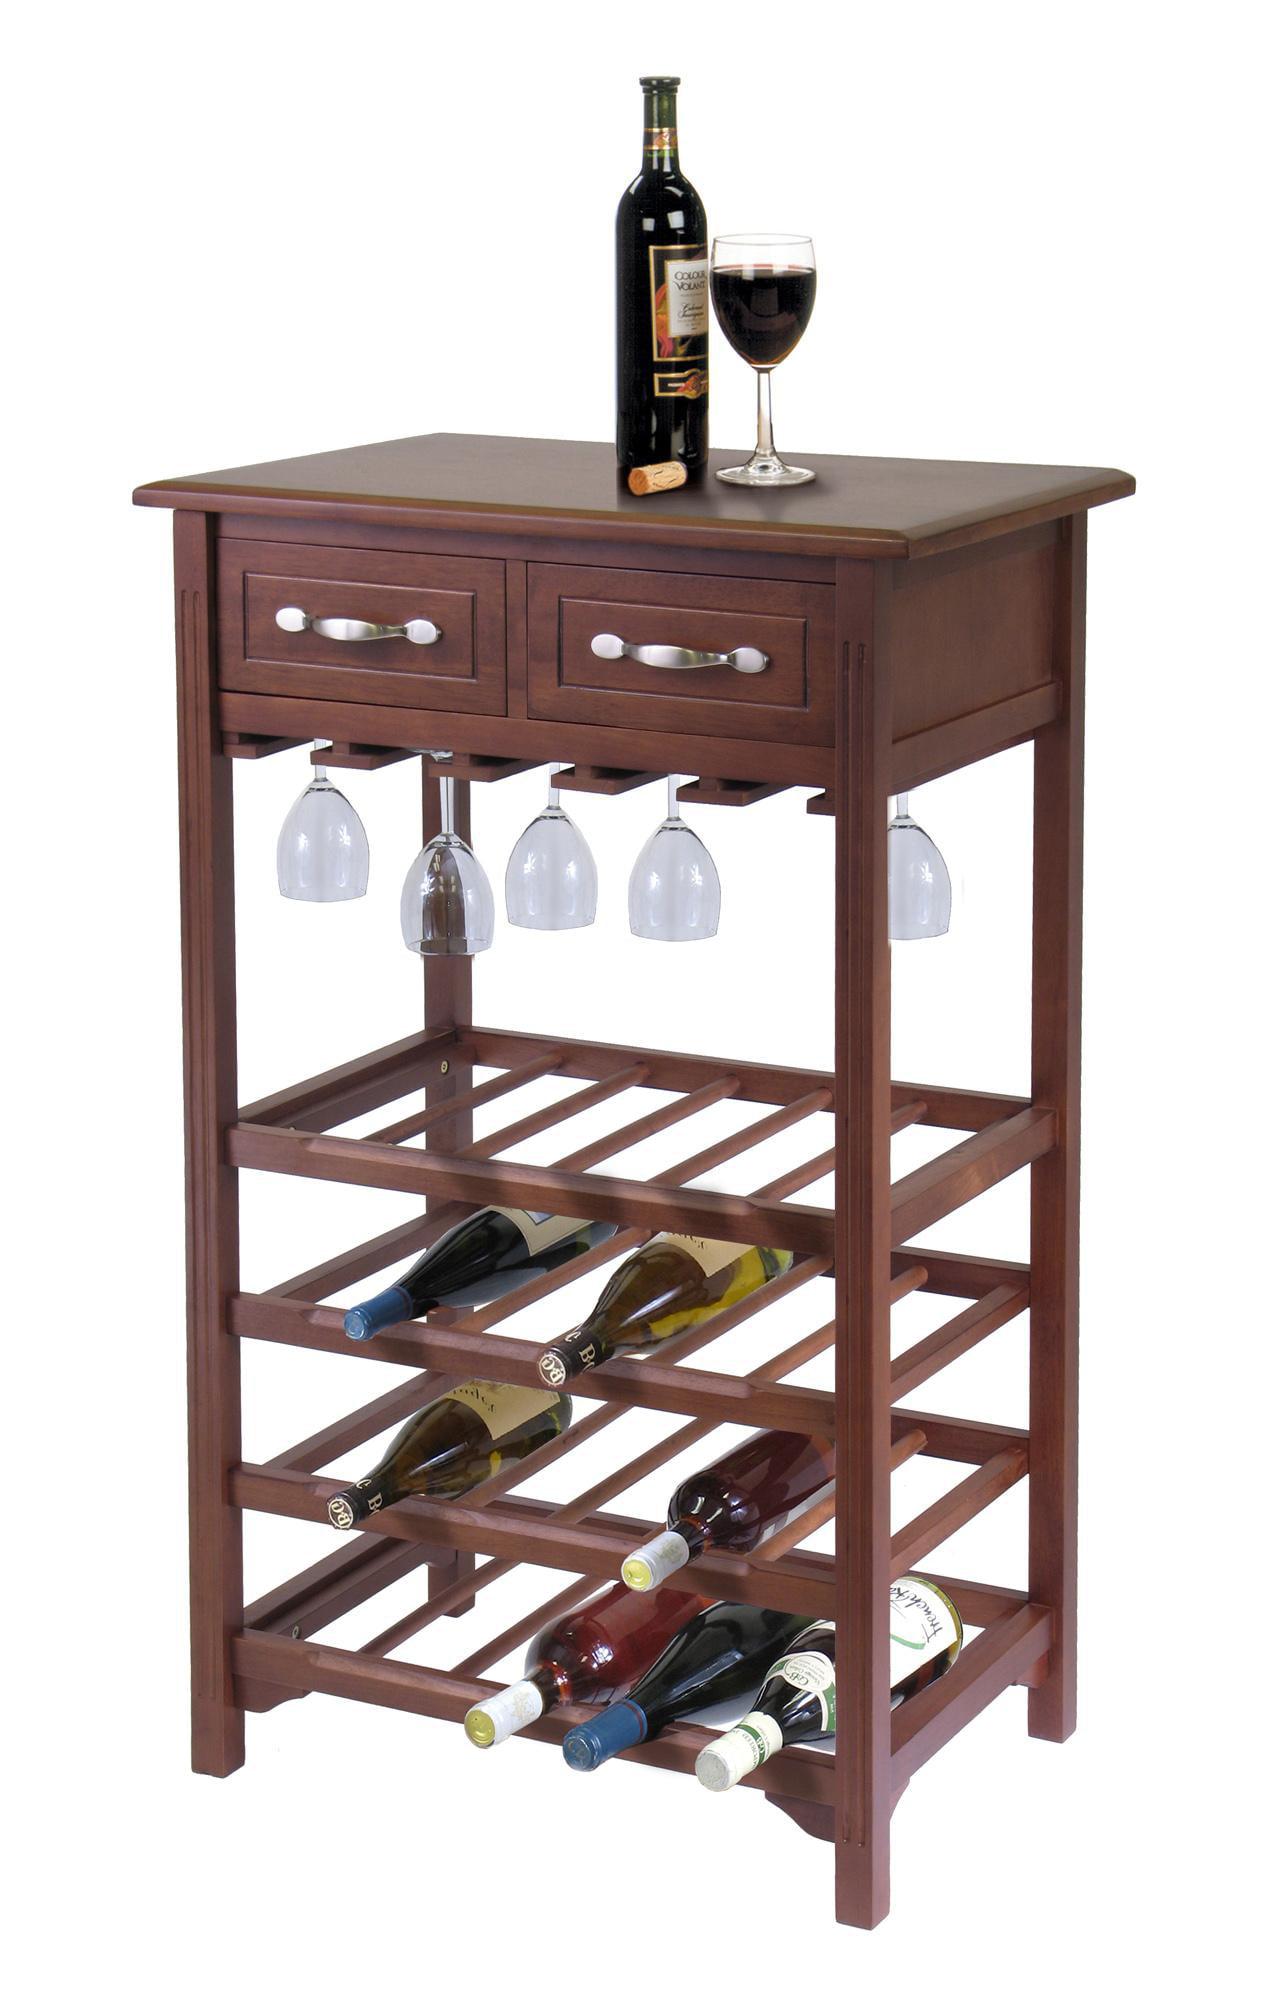 Walmart Furniture Online: Wine Rack With 2 Drawers